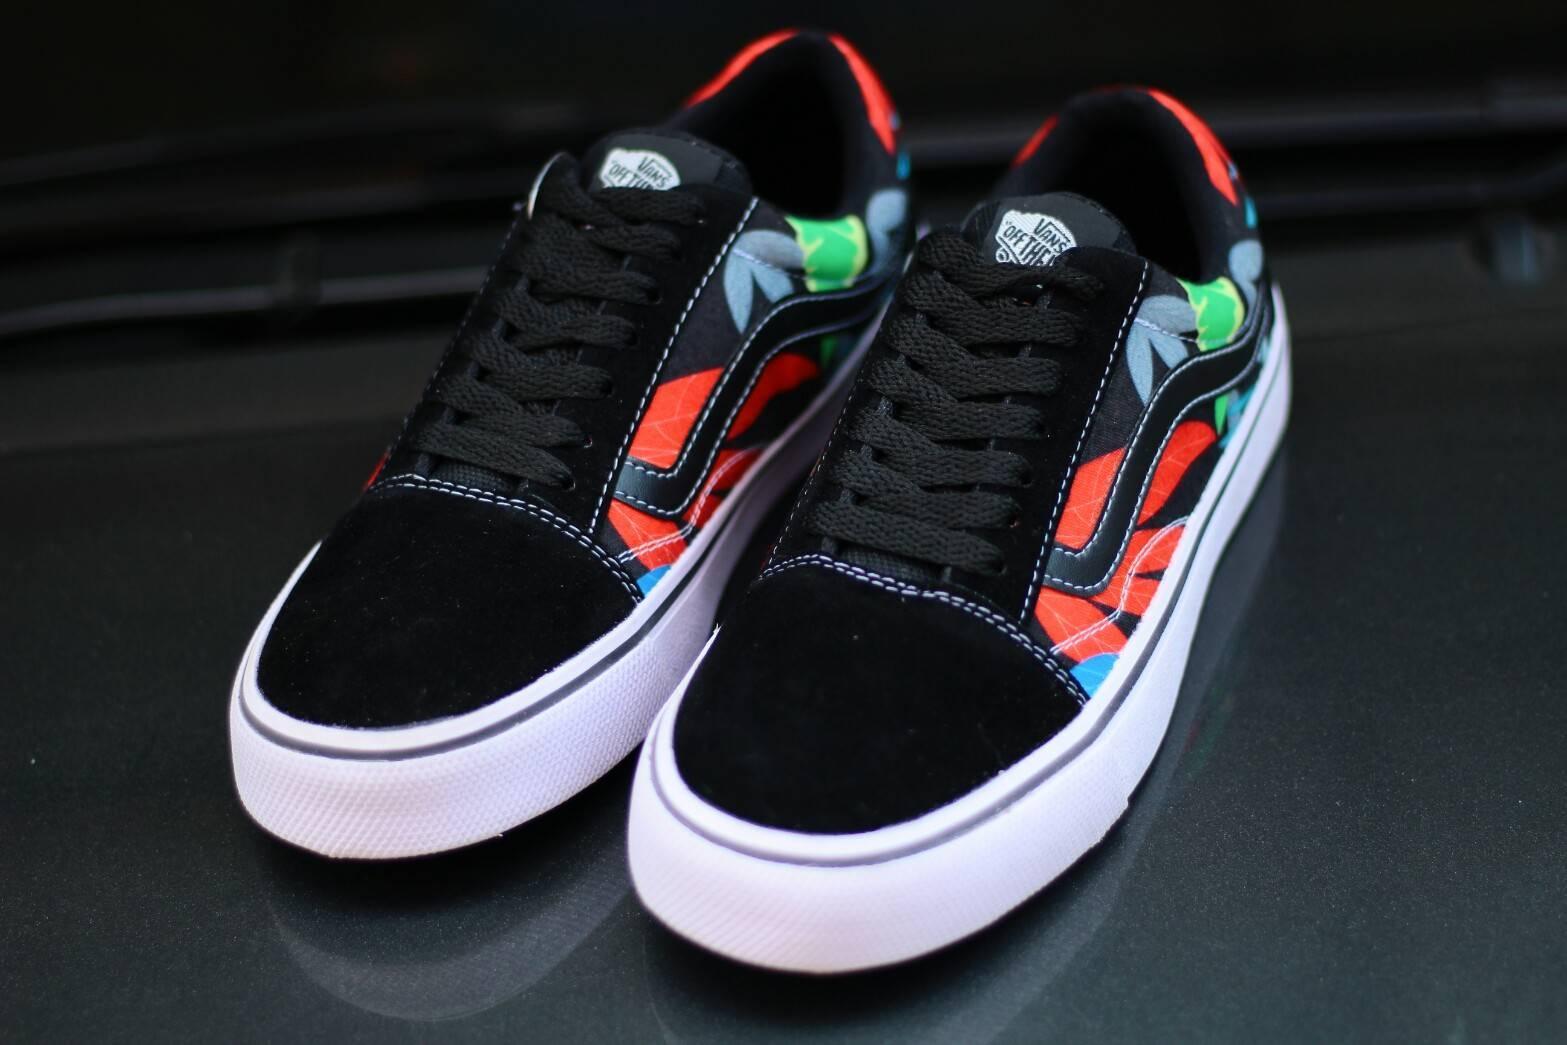 Sepatu Classic Vans Old Skool Skate Motif Off The Wall